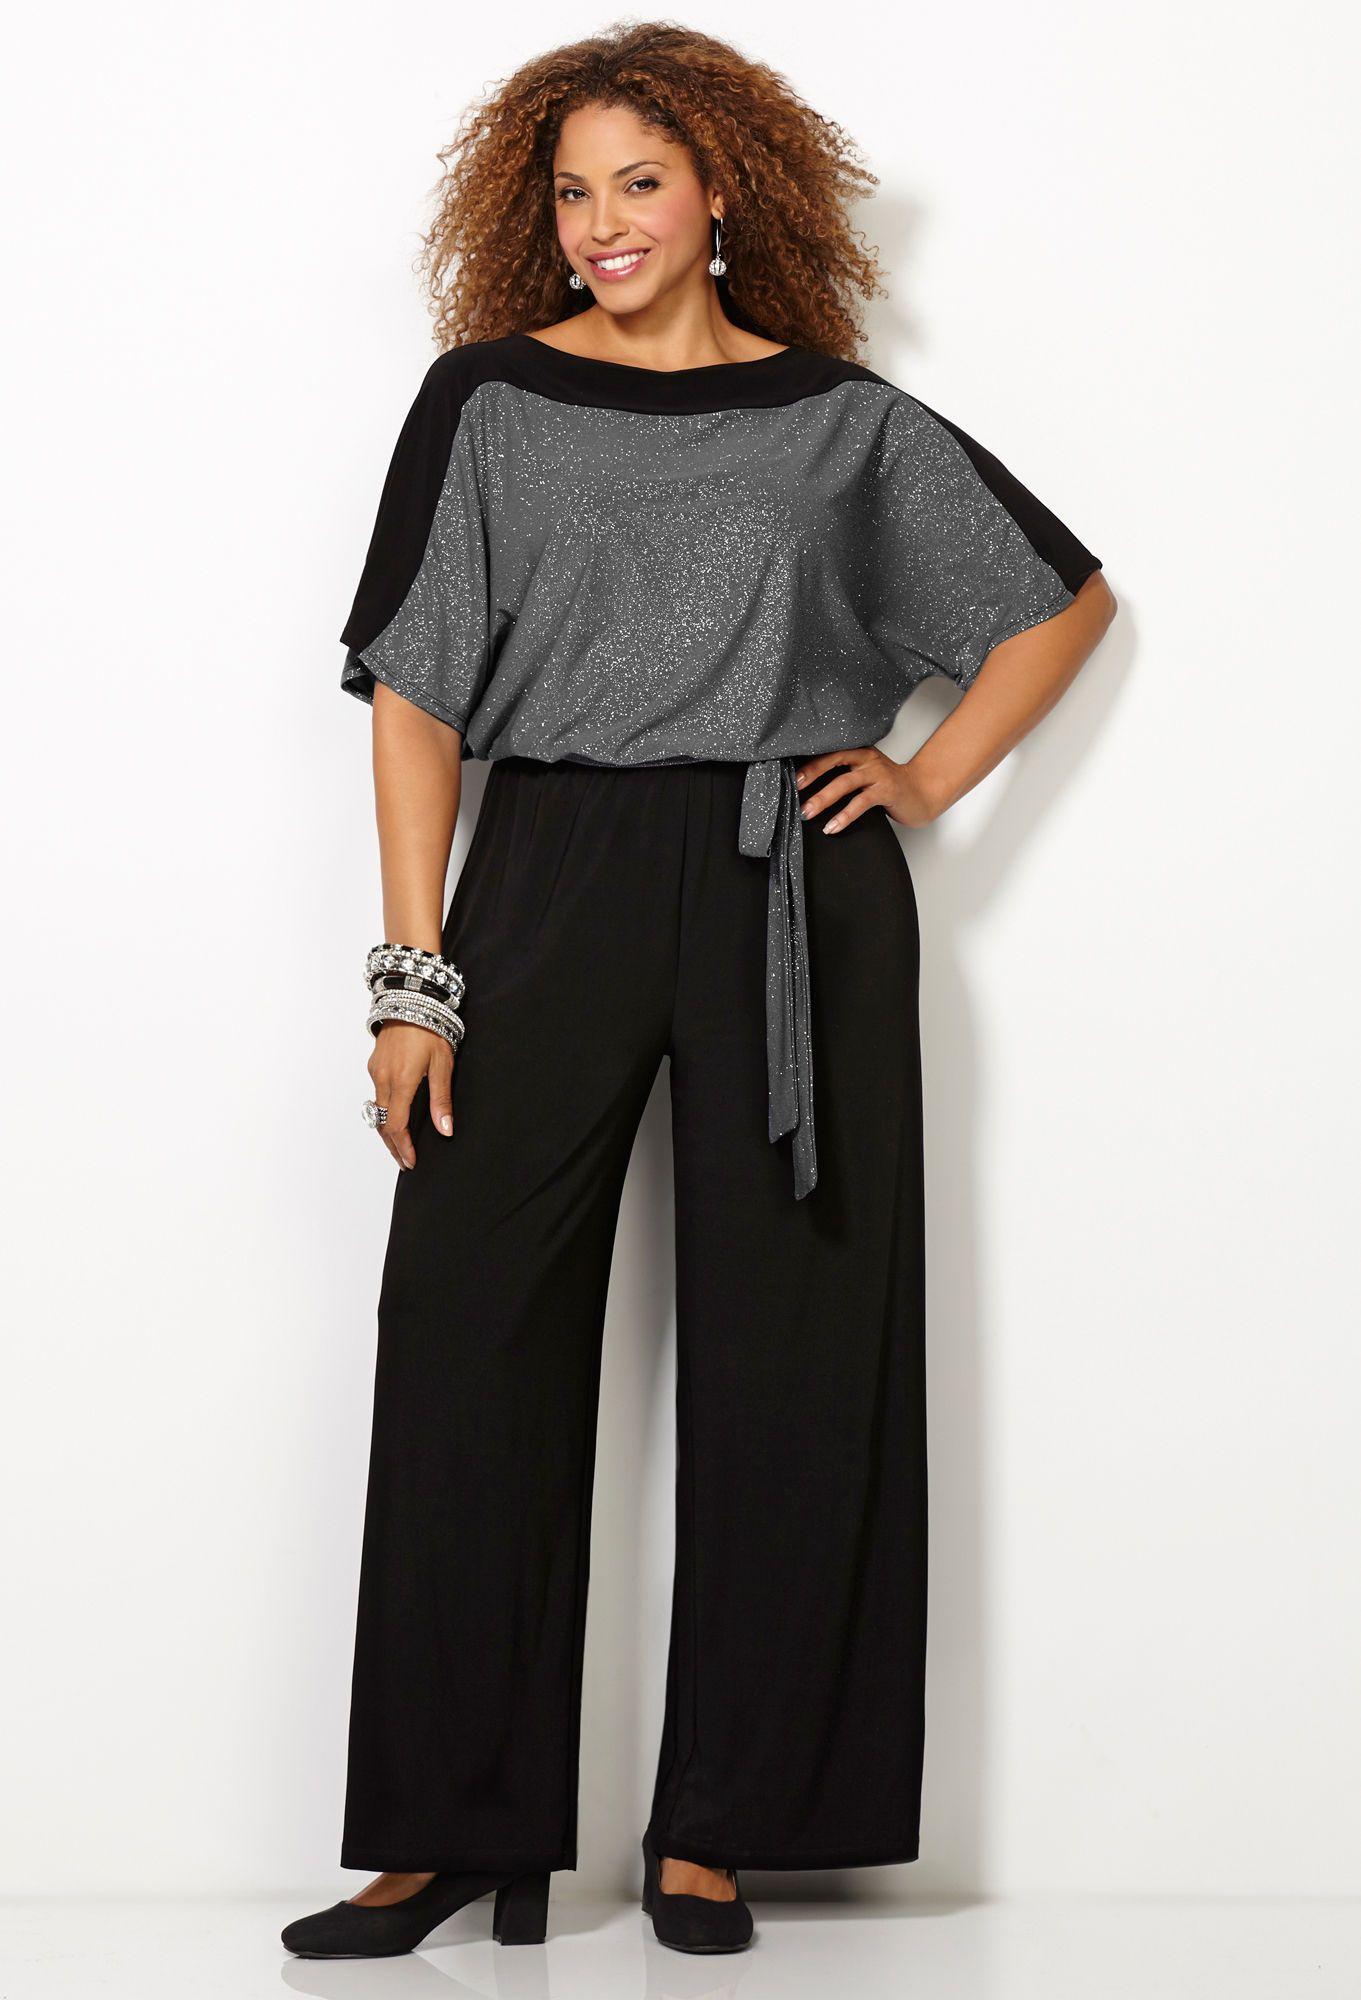 Shop Plus Size Maxi Dresses and Jumpsuits | Avenue.com in ...